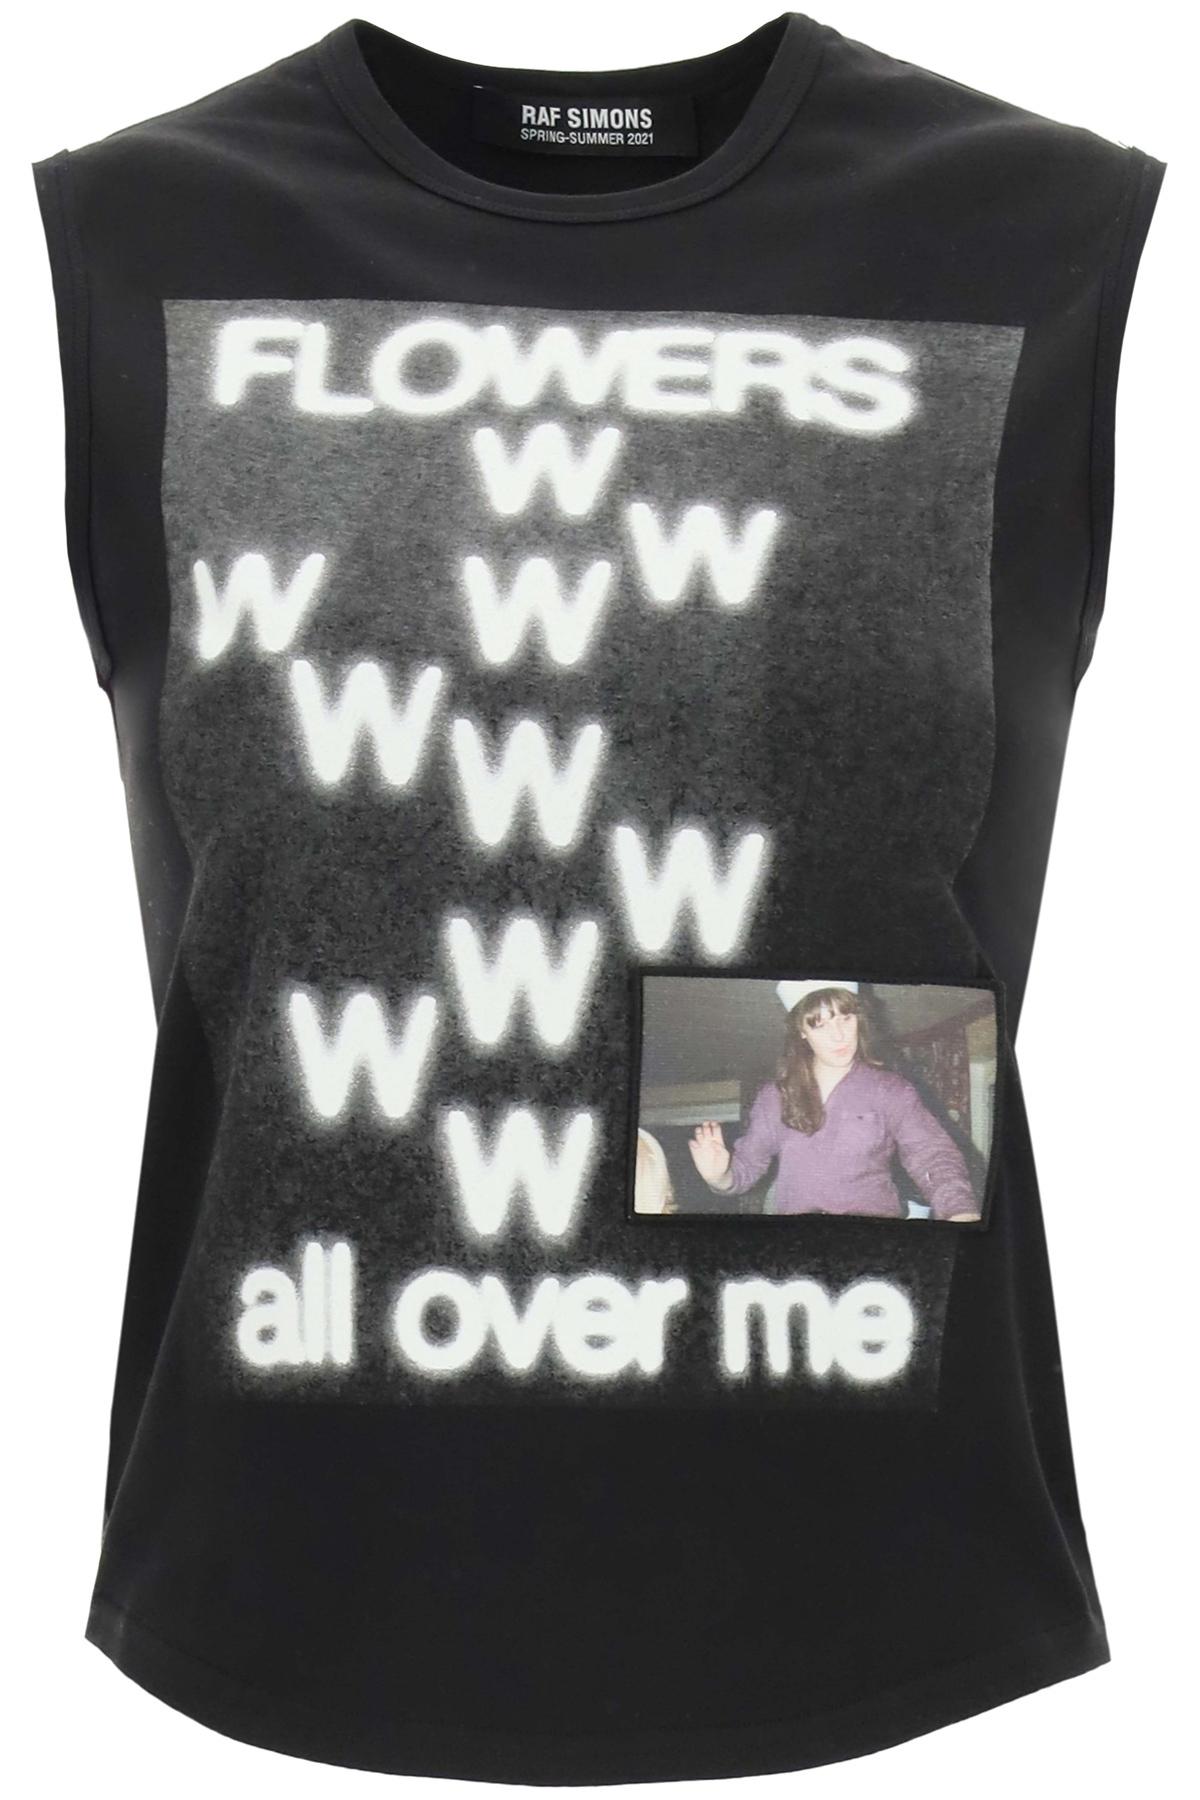 Raf simons top stampa flowers